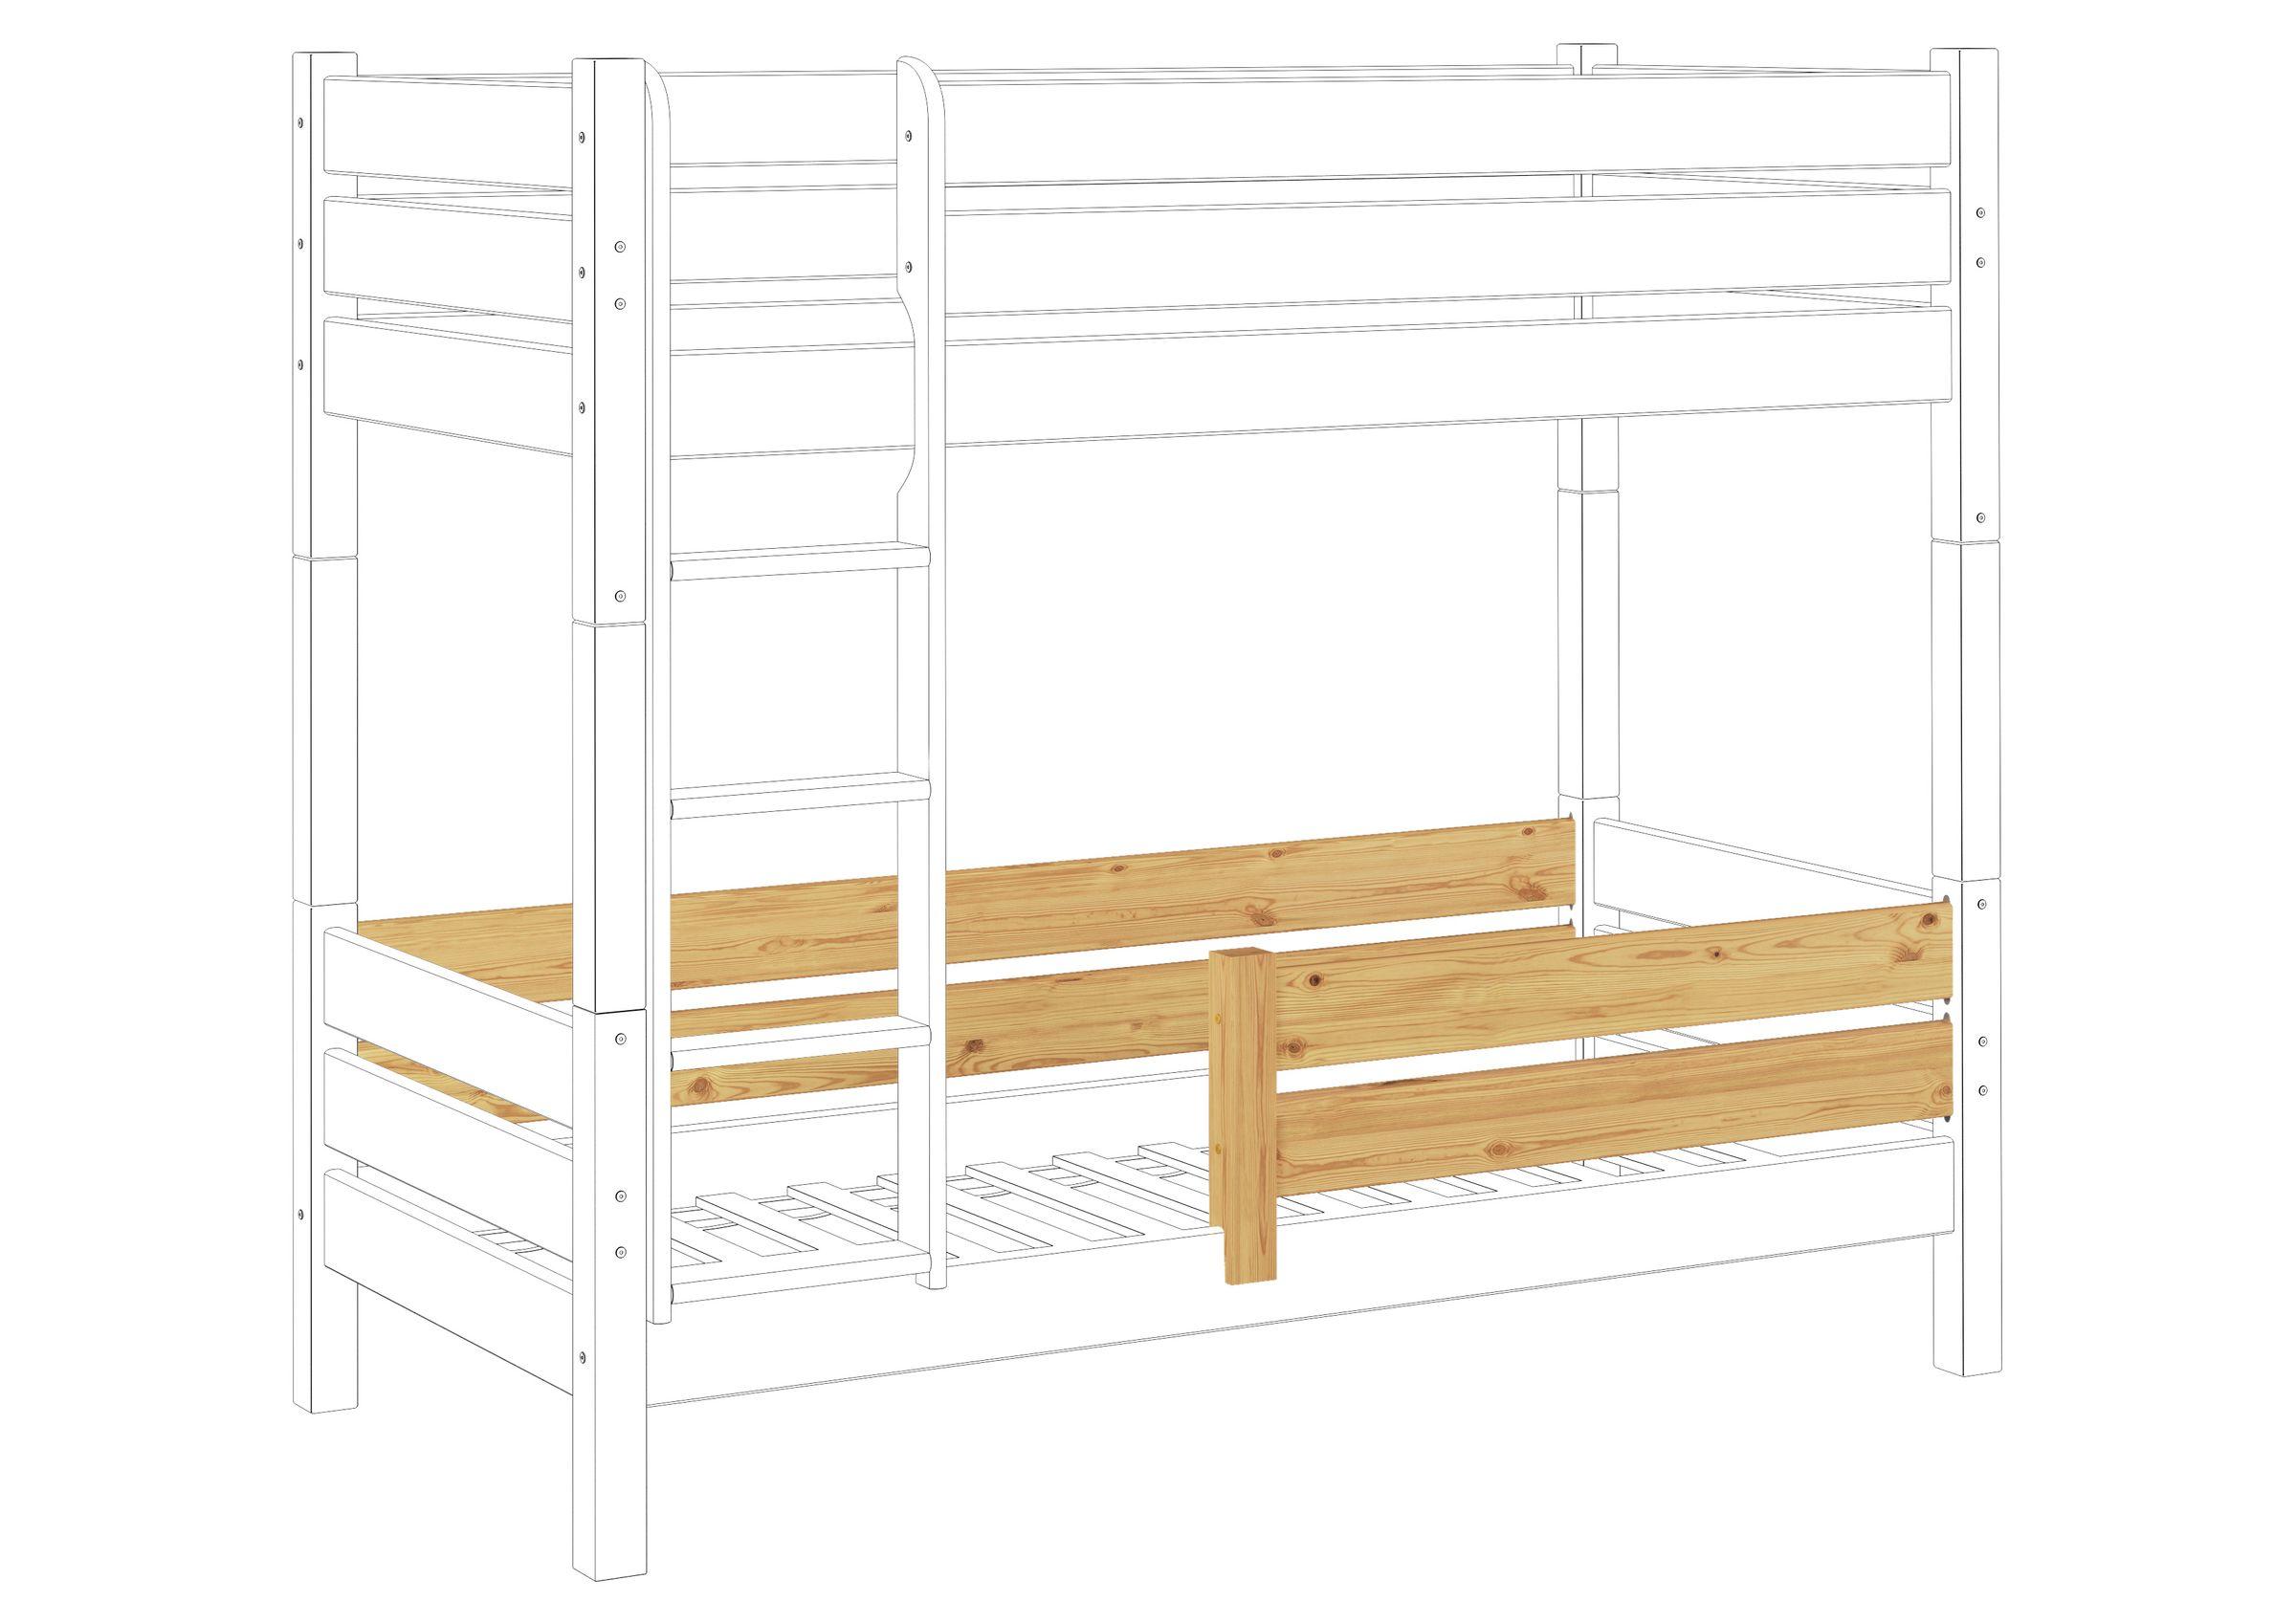 kindersicherung rausfallschutz f r etagenbetten modell f r untere liegefl che kisi 16. Black Bedroom Furniture Sets. Home Design Ideas